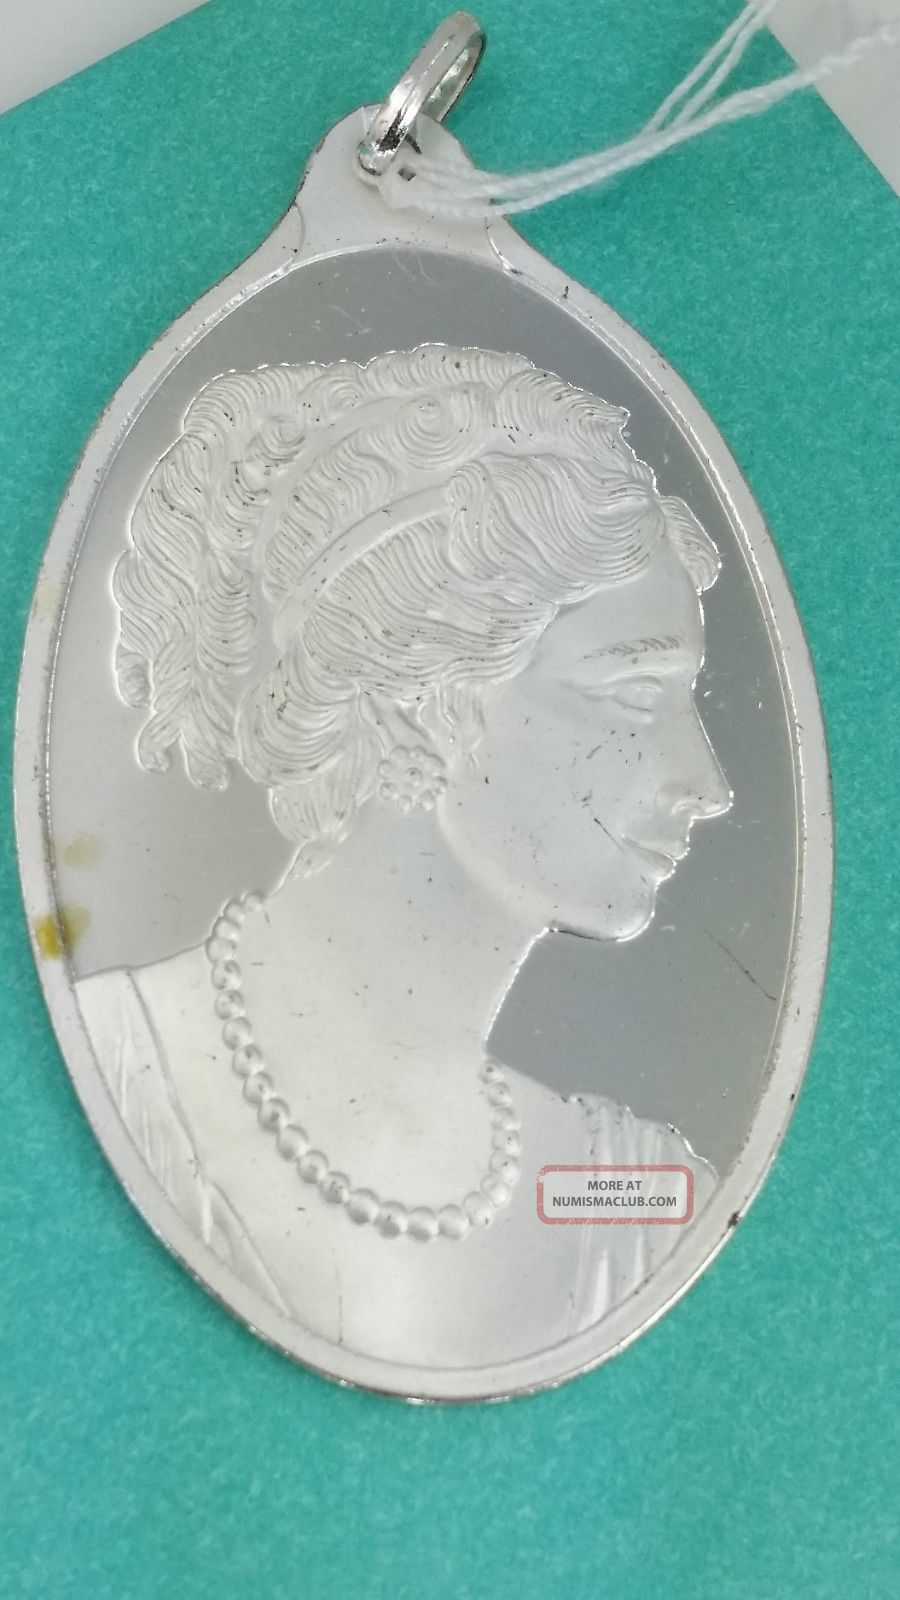 Rare Pamp Suisse Lady Fortuna Half Ounce 1 2 Oz Pure Fine